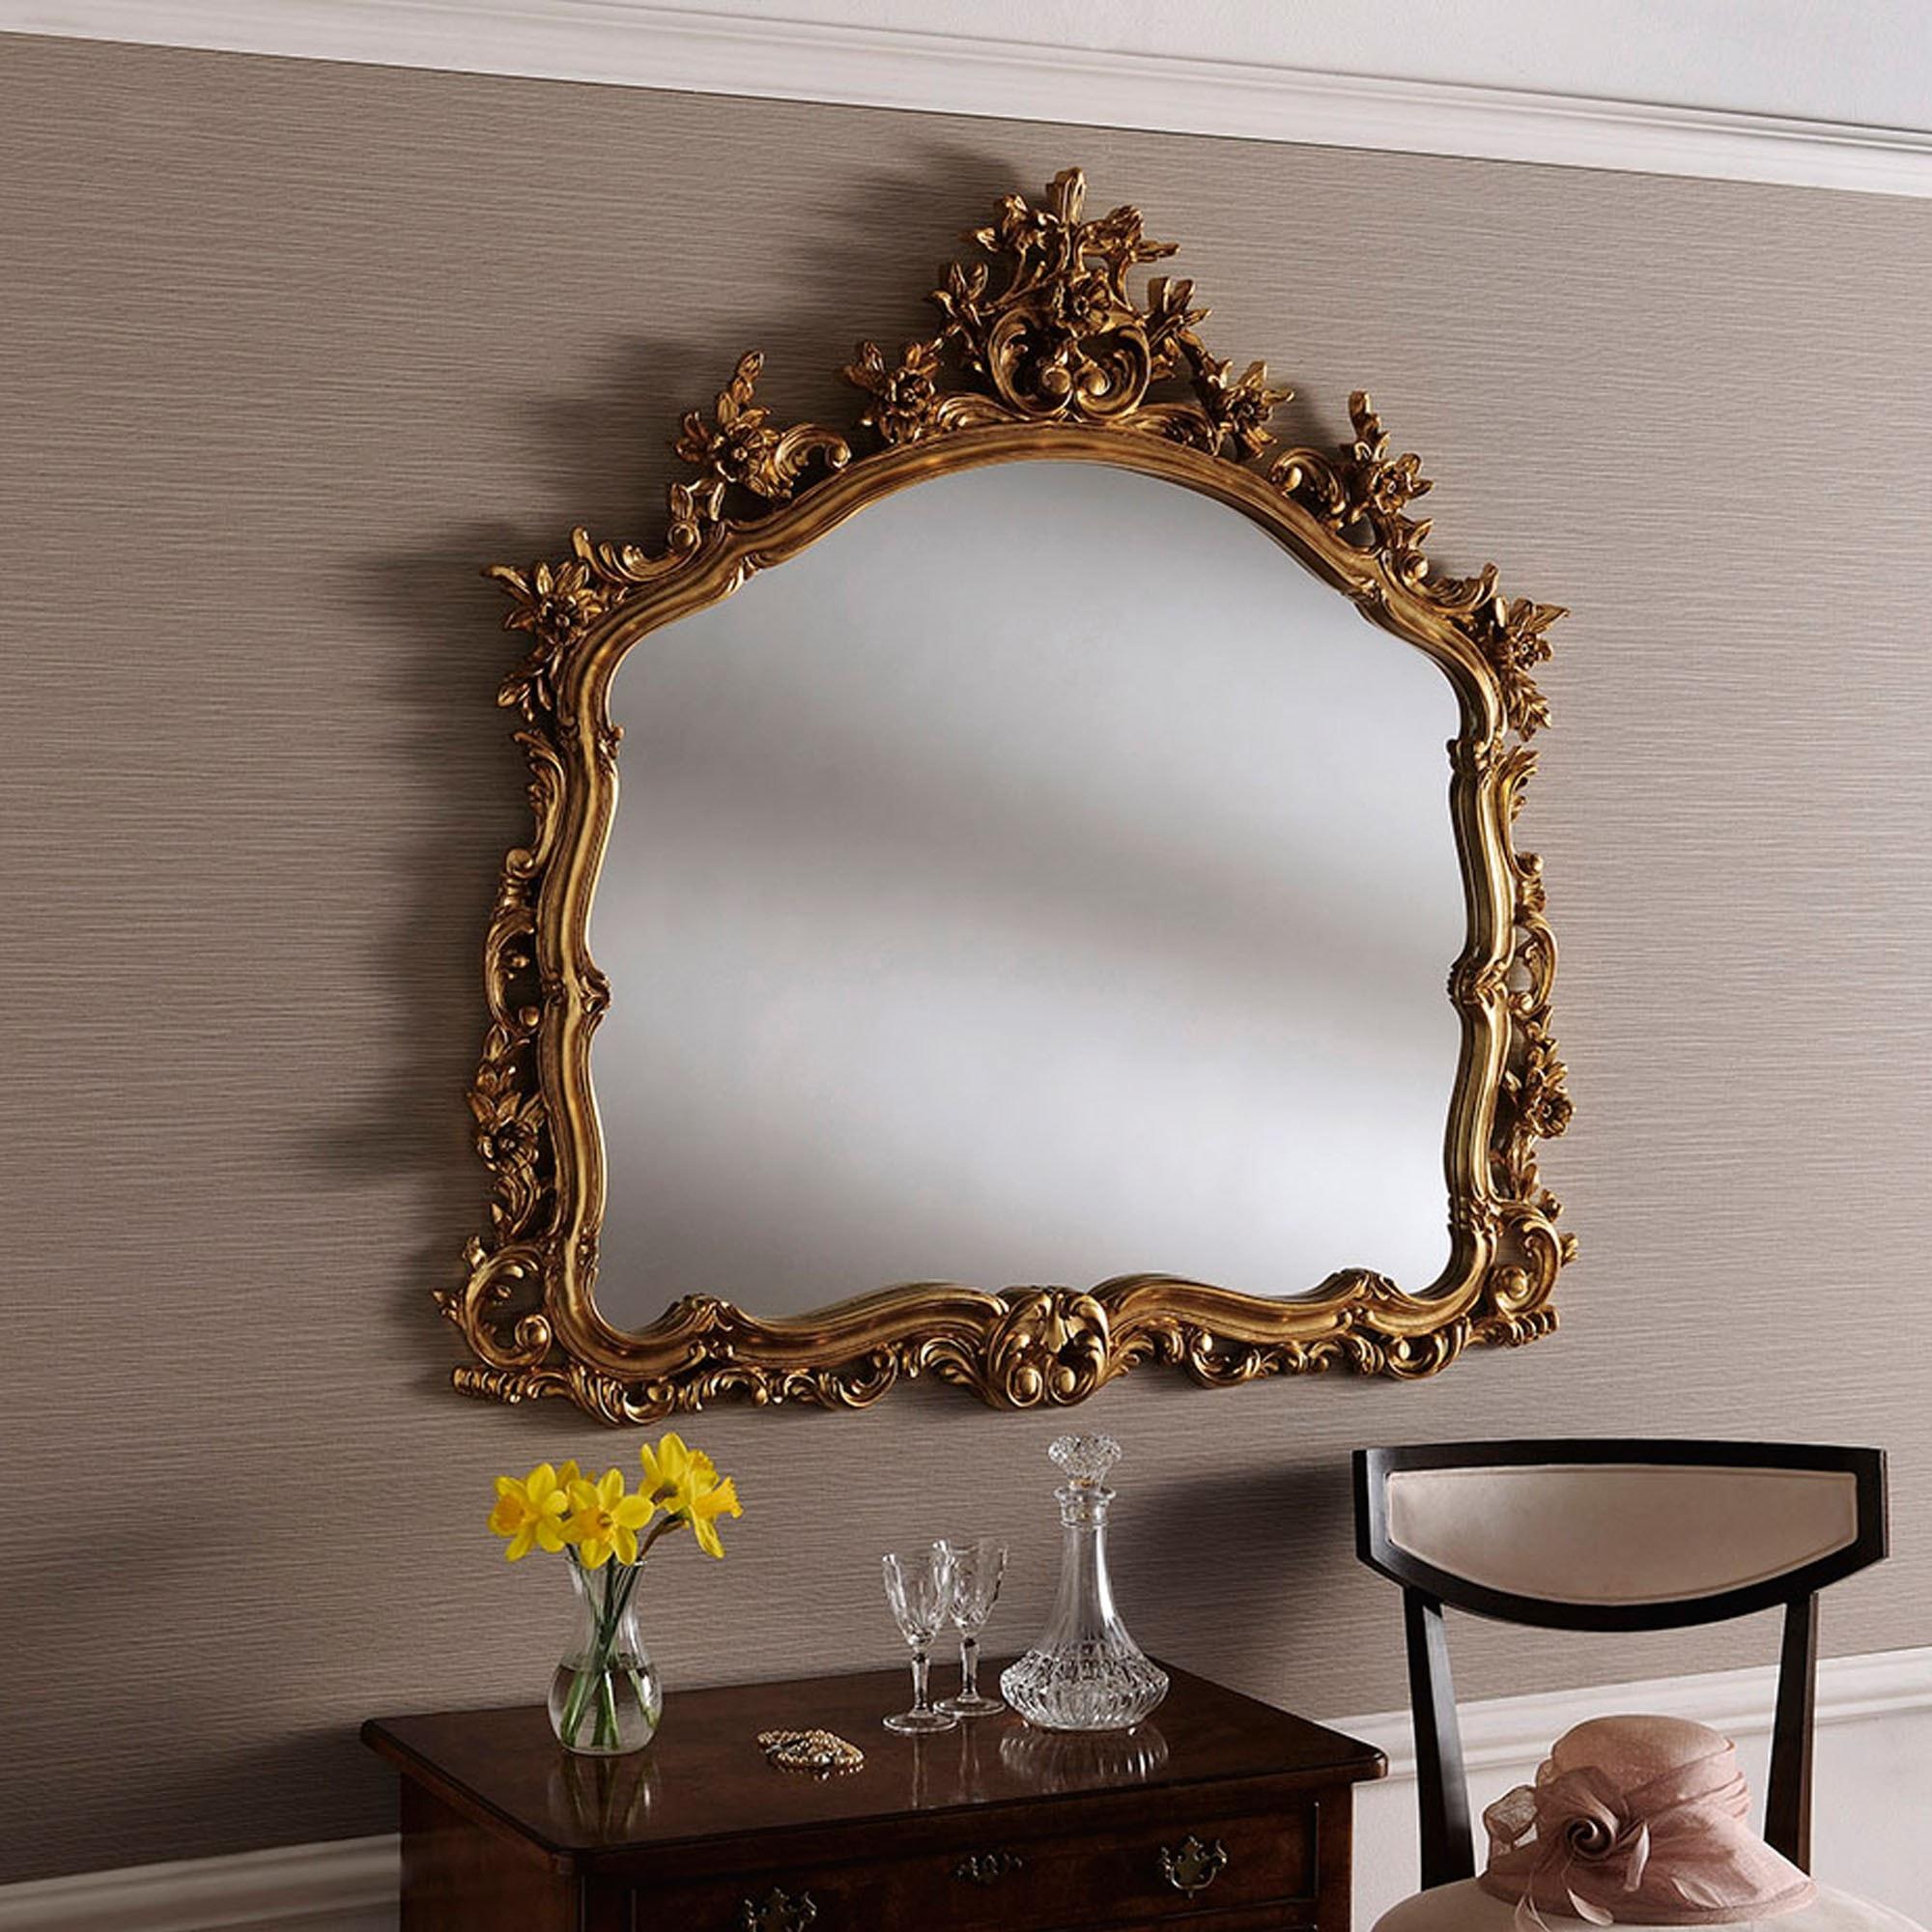 Decorative Gold Ornate Wall Mirror | Decorative Gold Mirror on Wall Mirrors id=76459